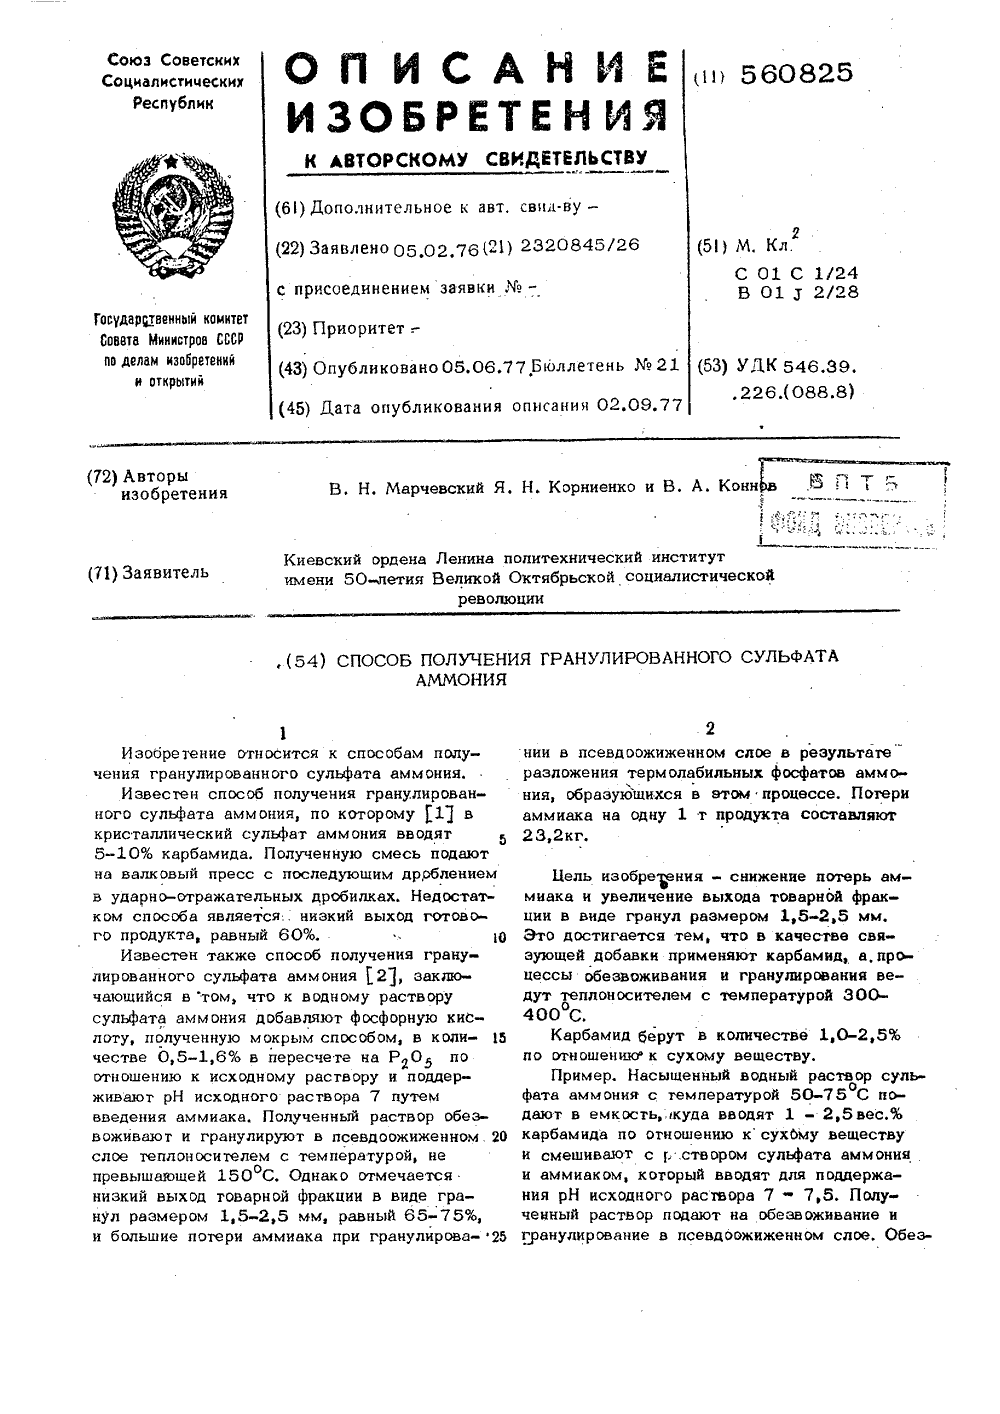 схема кабелеискателя ки-4 п